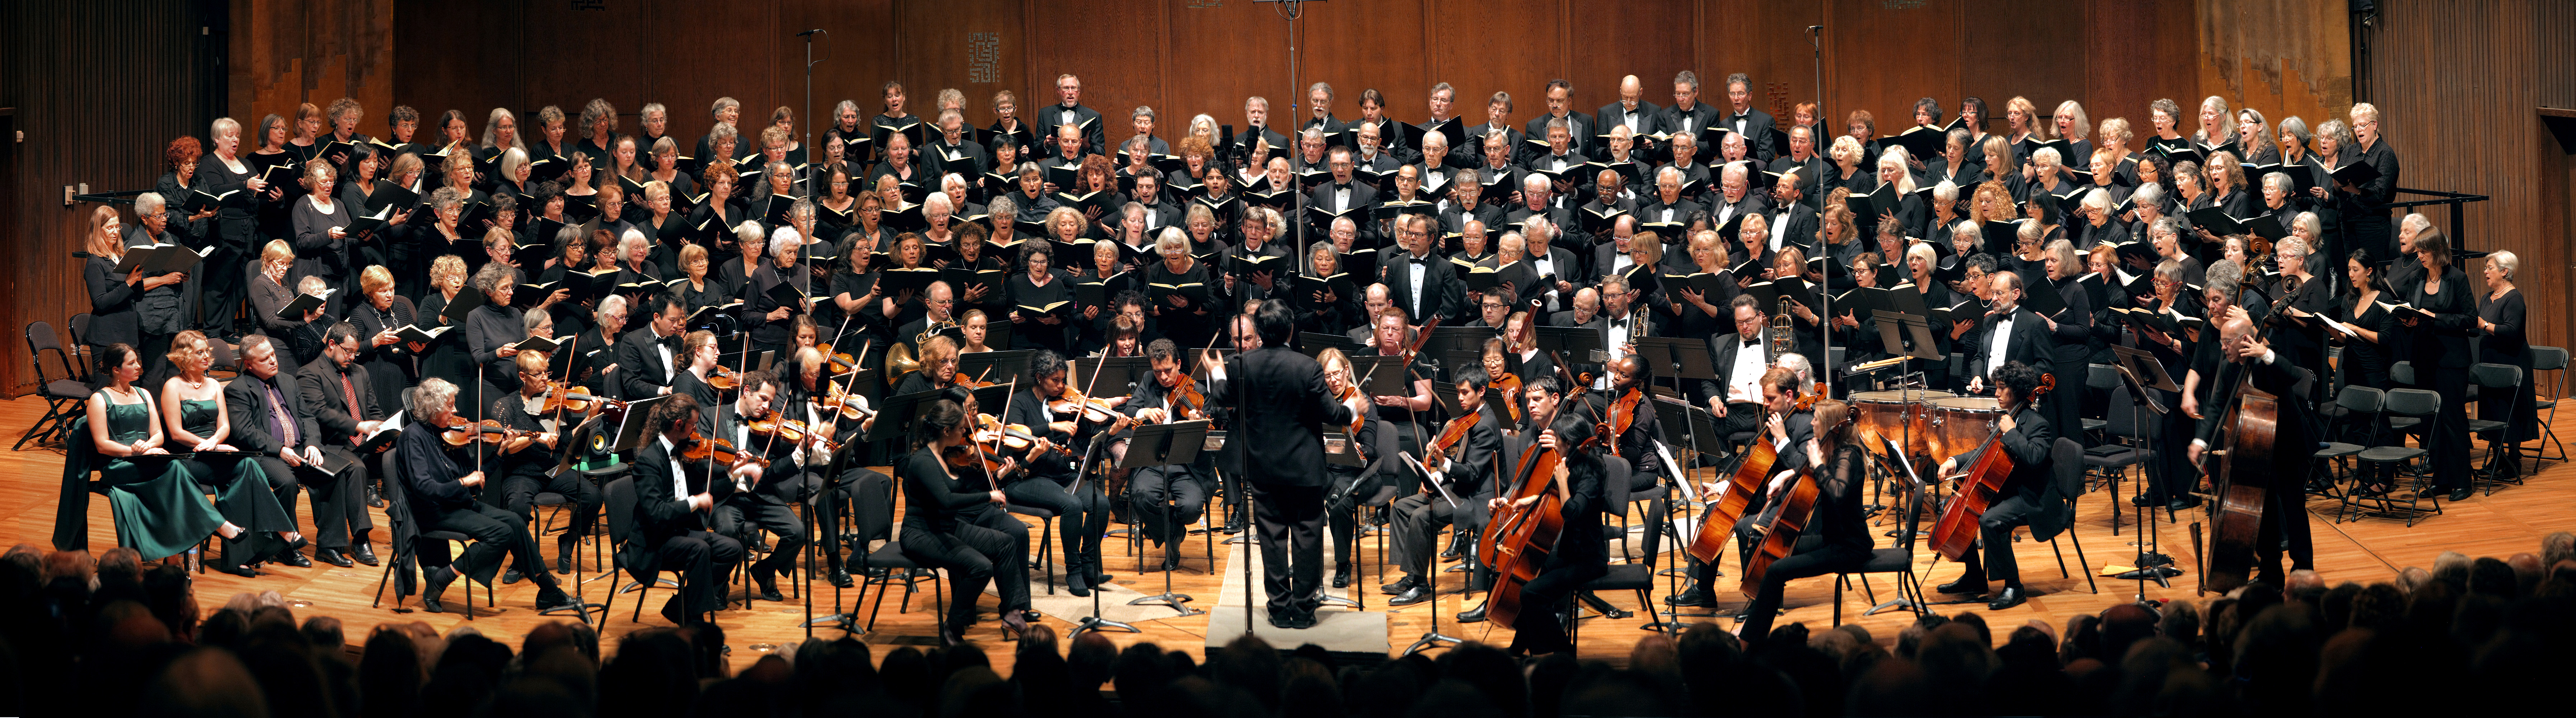 12-16-12G(web) Mozart, Great Mass in C Minor,  Hertz Hall, UC Berkeley,  Fall, 2012